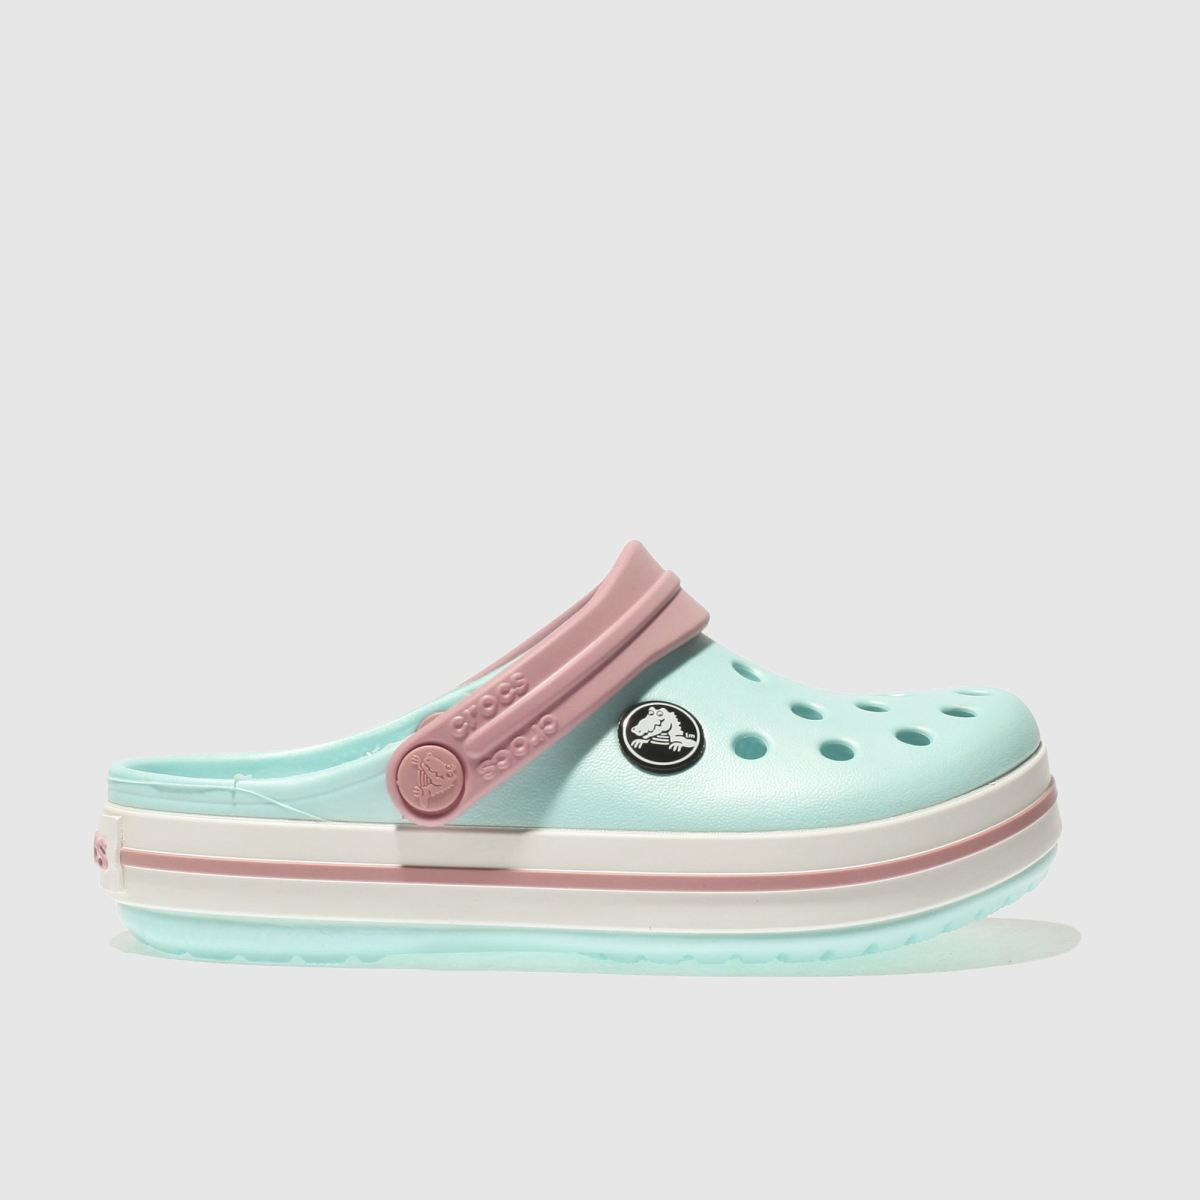 Crocs Crocs Pale Blue Crocband Clog Girls Junior Sandals